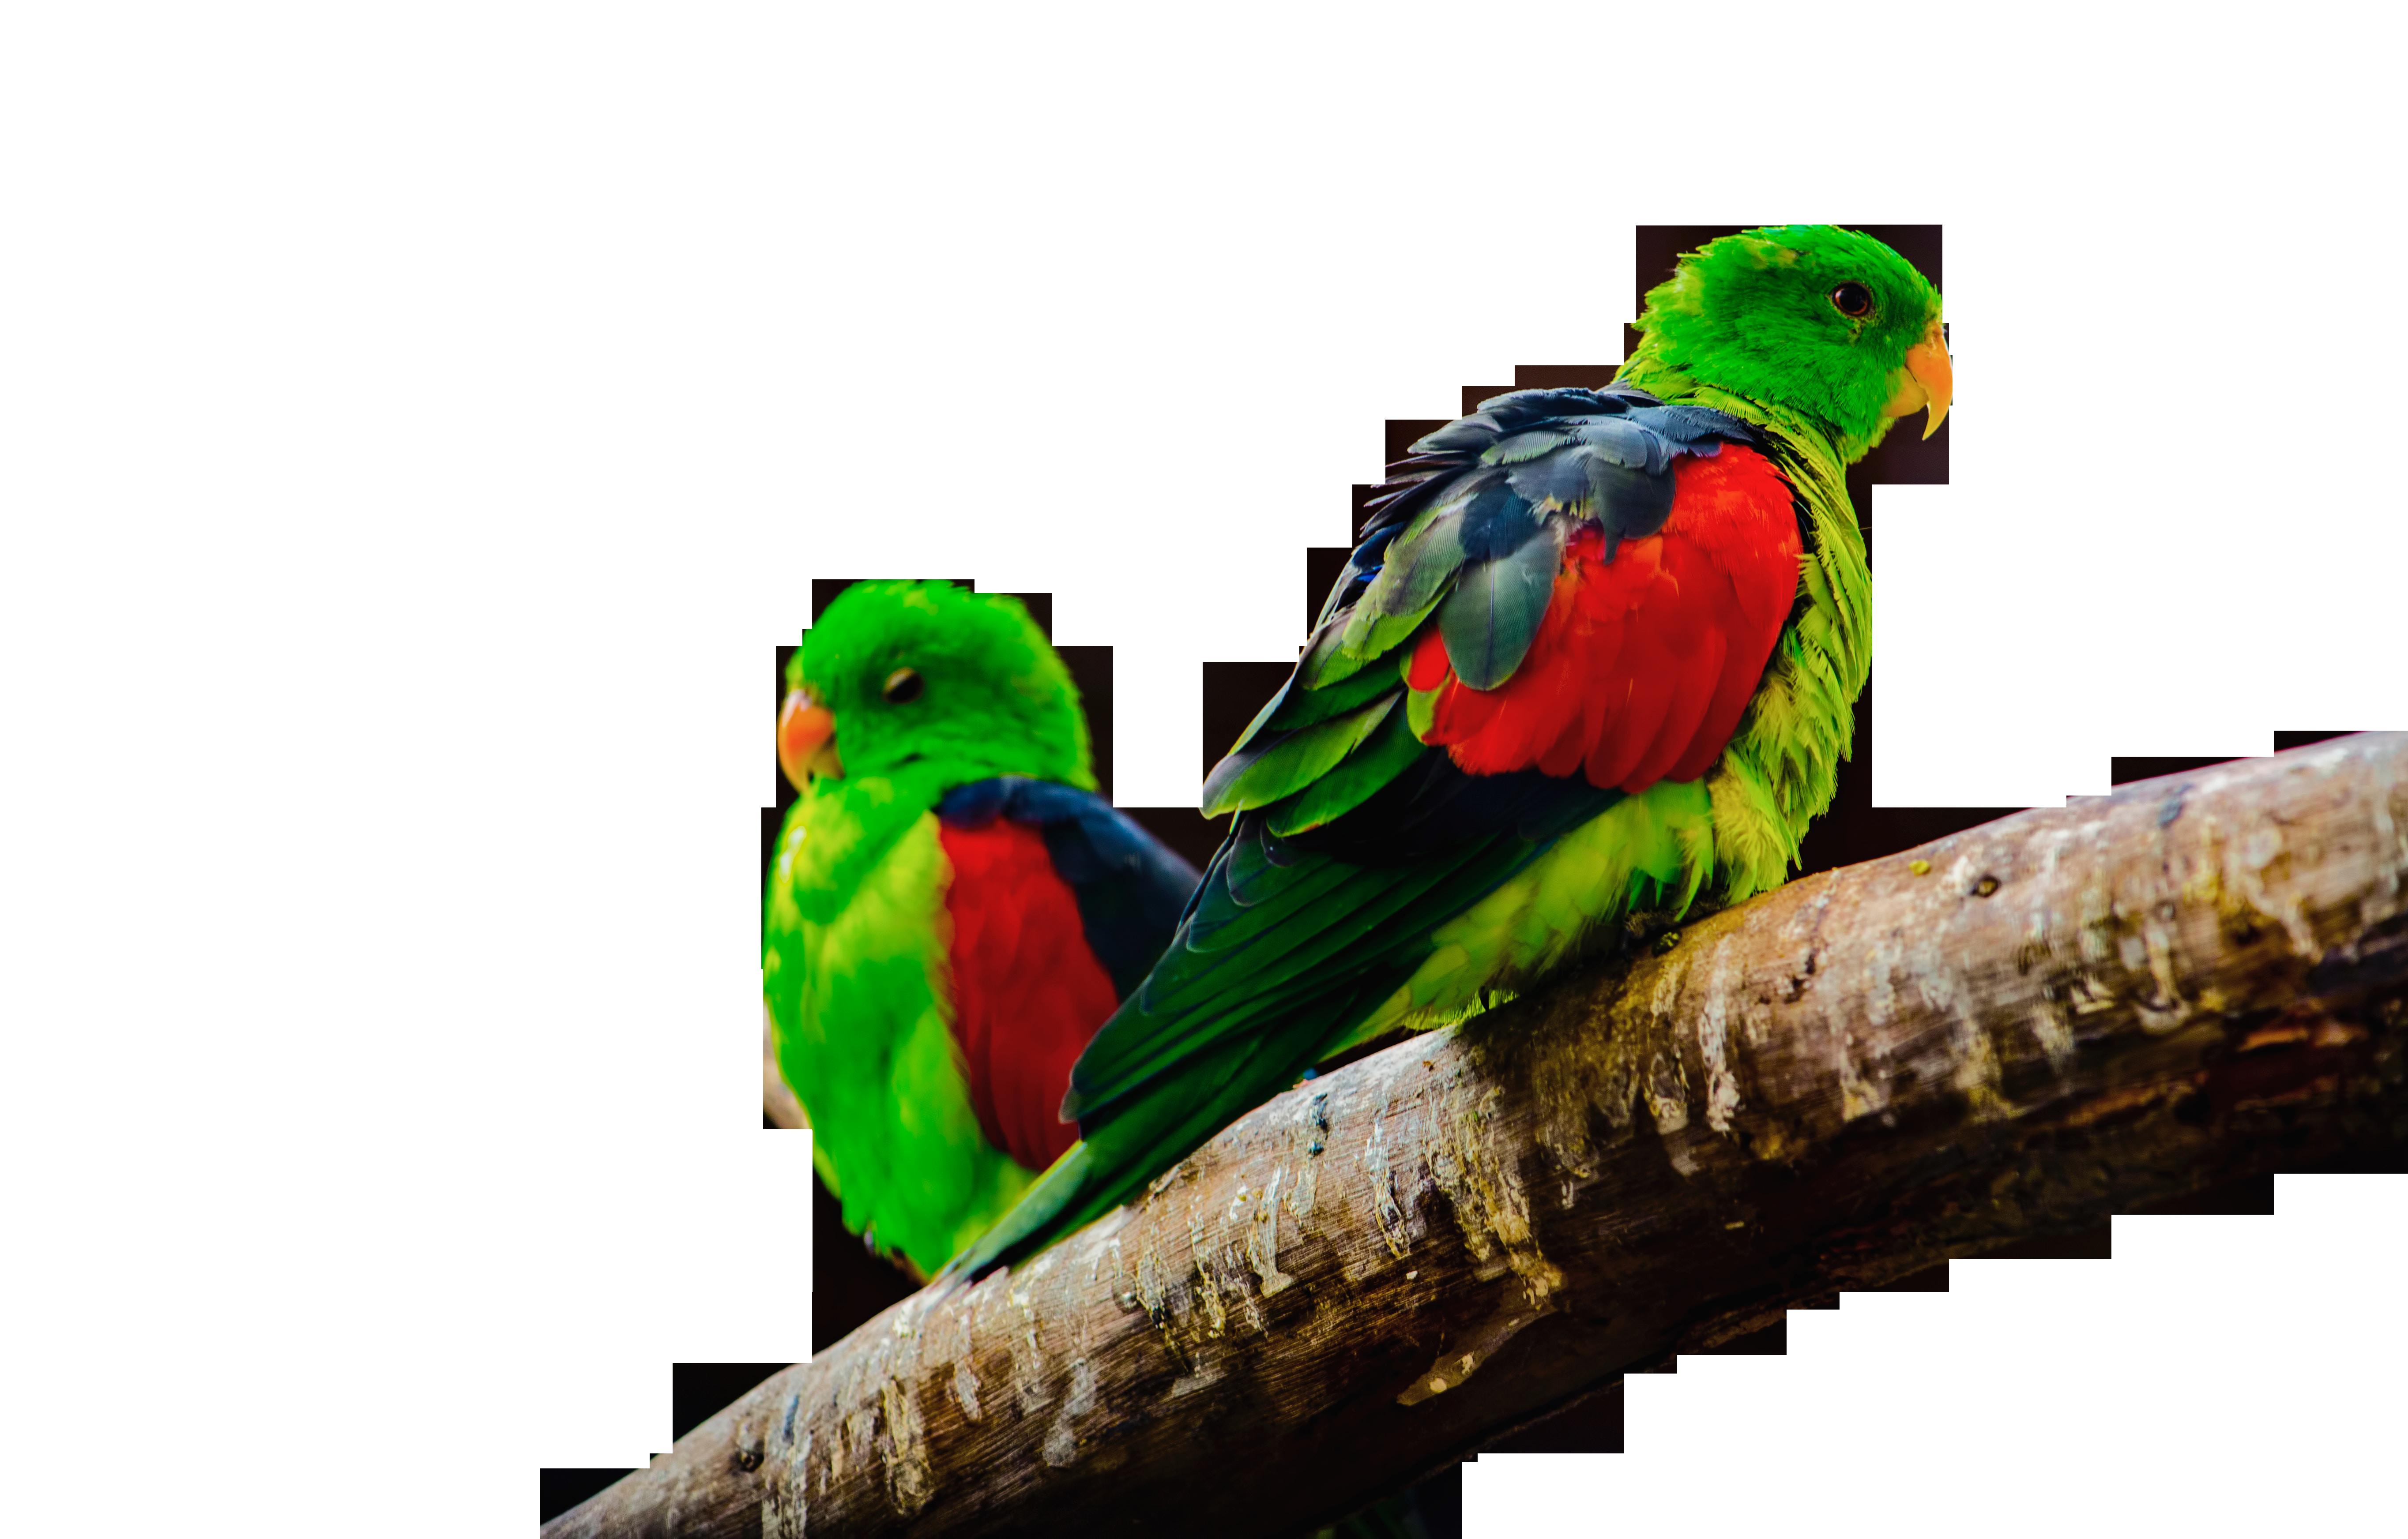 Parrots Sitting on Branch Transparent Background PNG